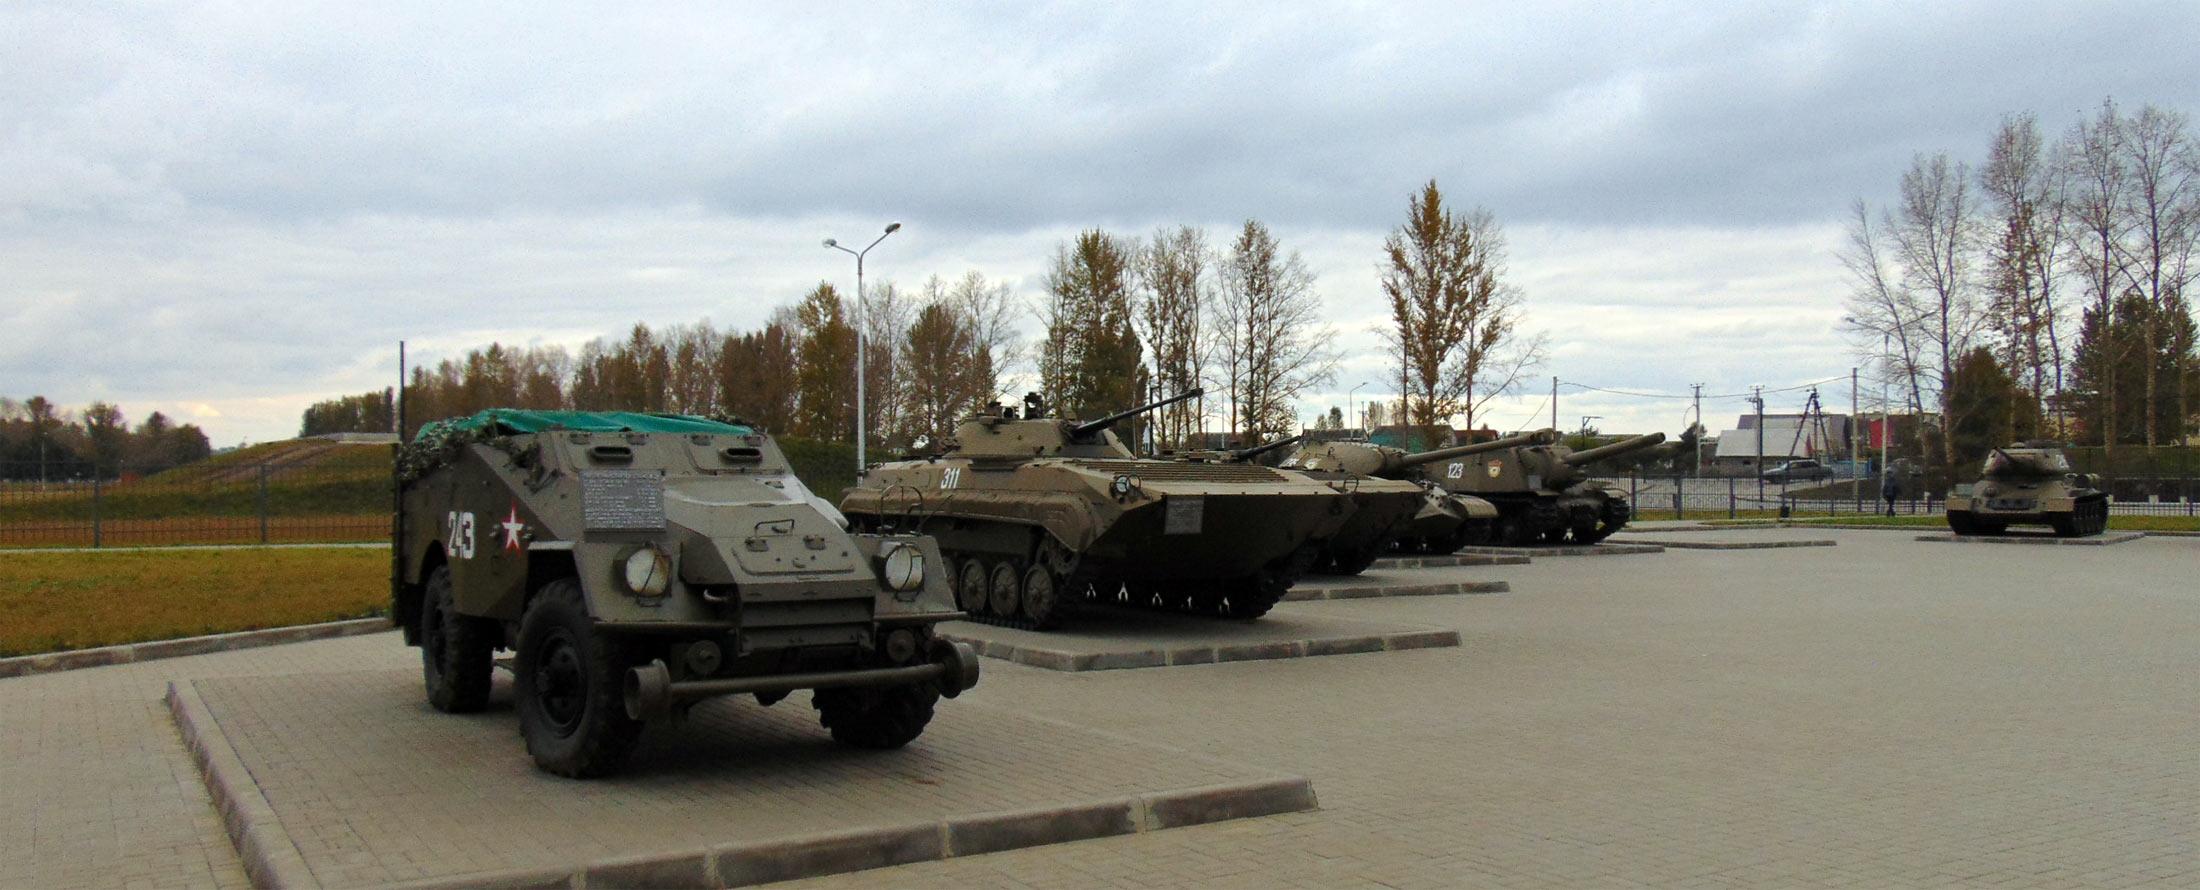 tank driving